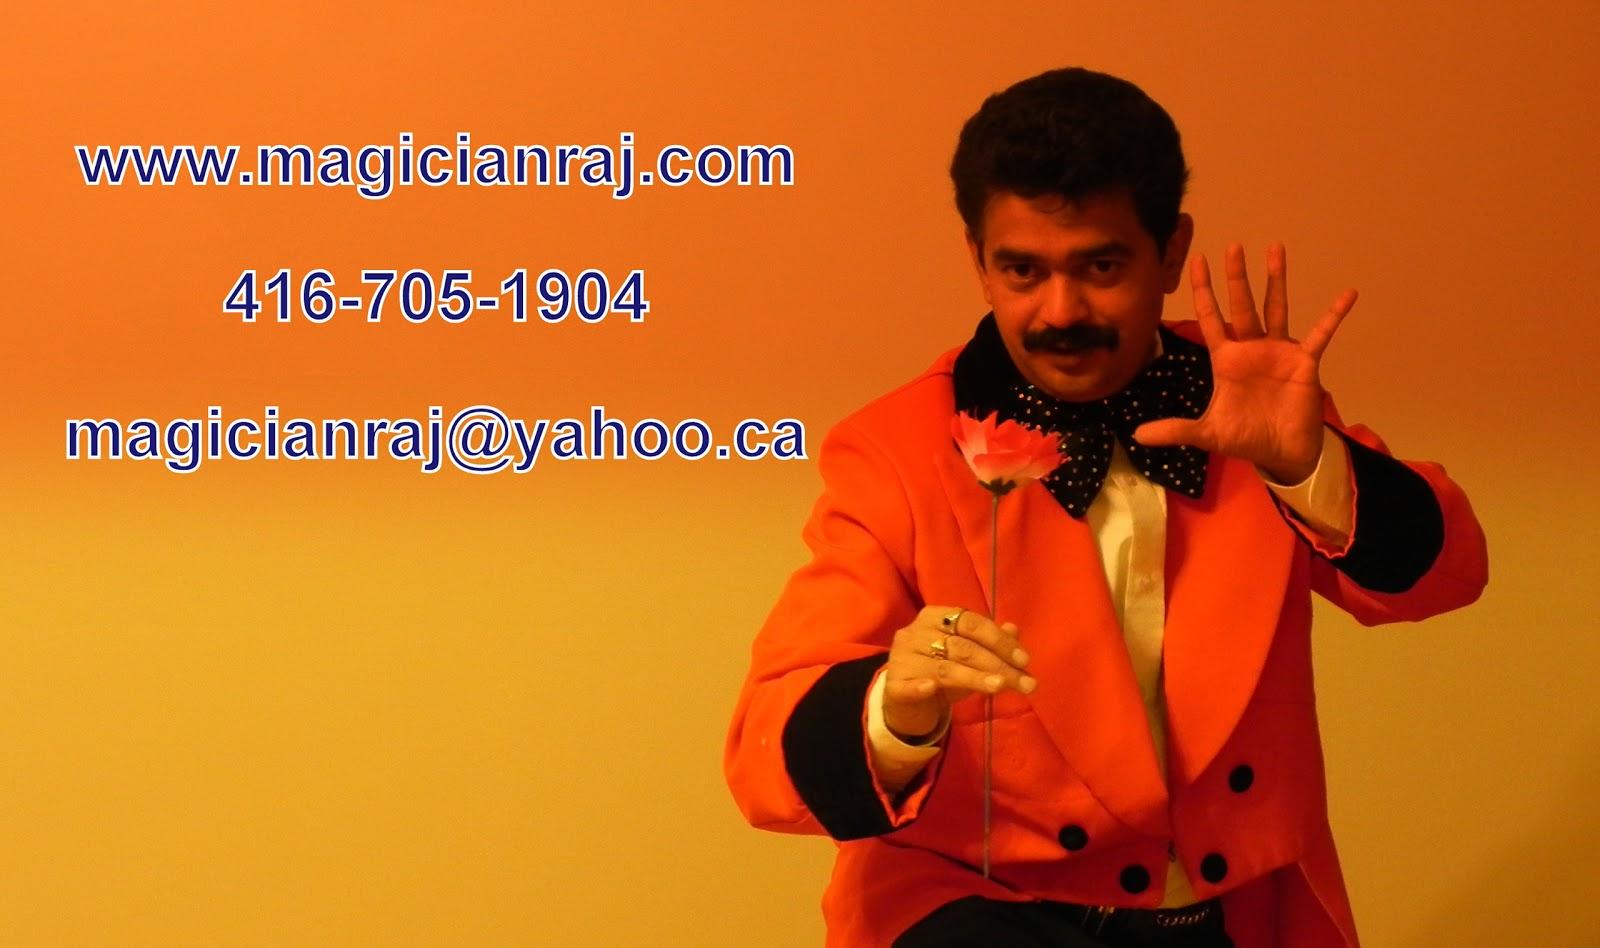 Professional Magician Toronto Canada